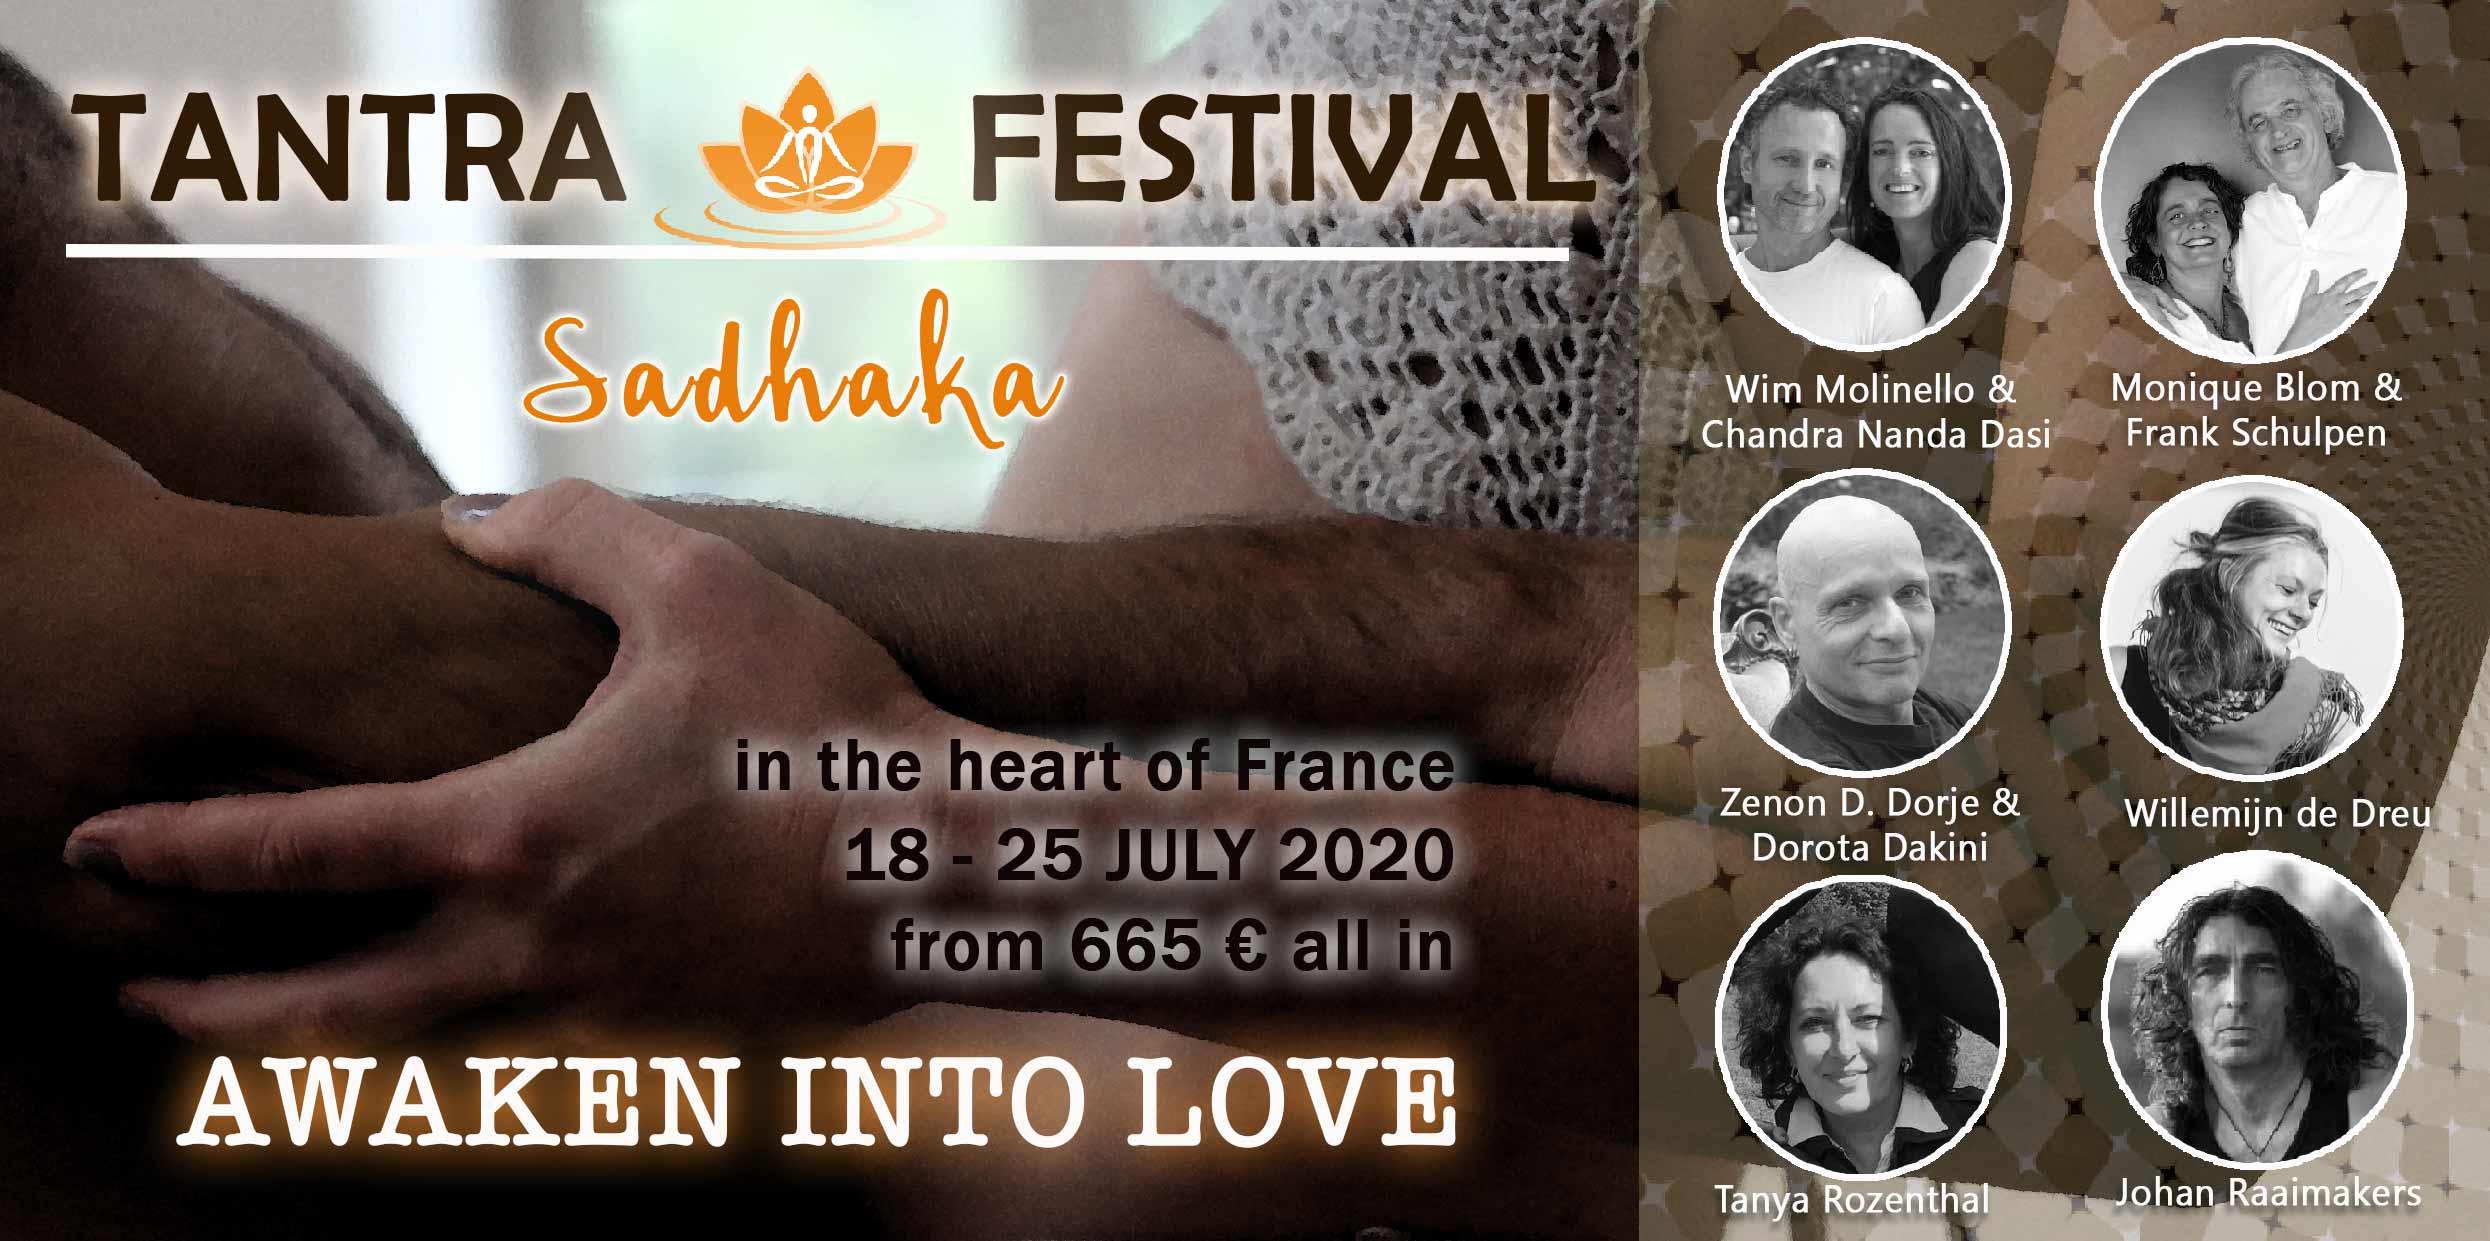 Sadhaka Tantra festival juli 2020 Frankrijk